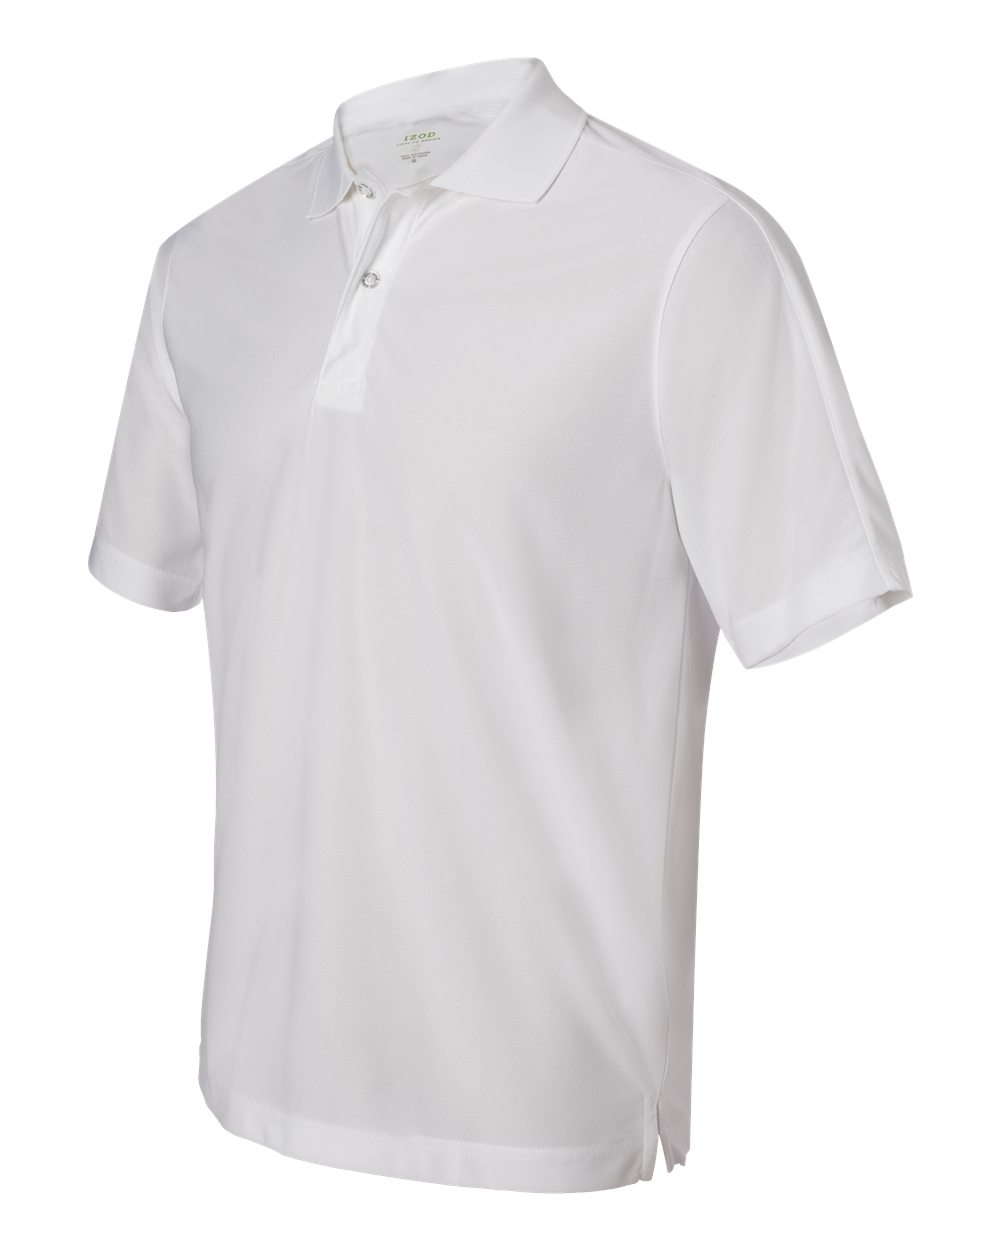 Izod 13Z0075  Men's Performance Golf Pique Polo